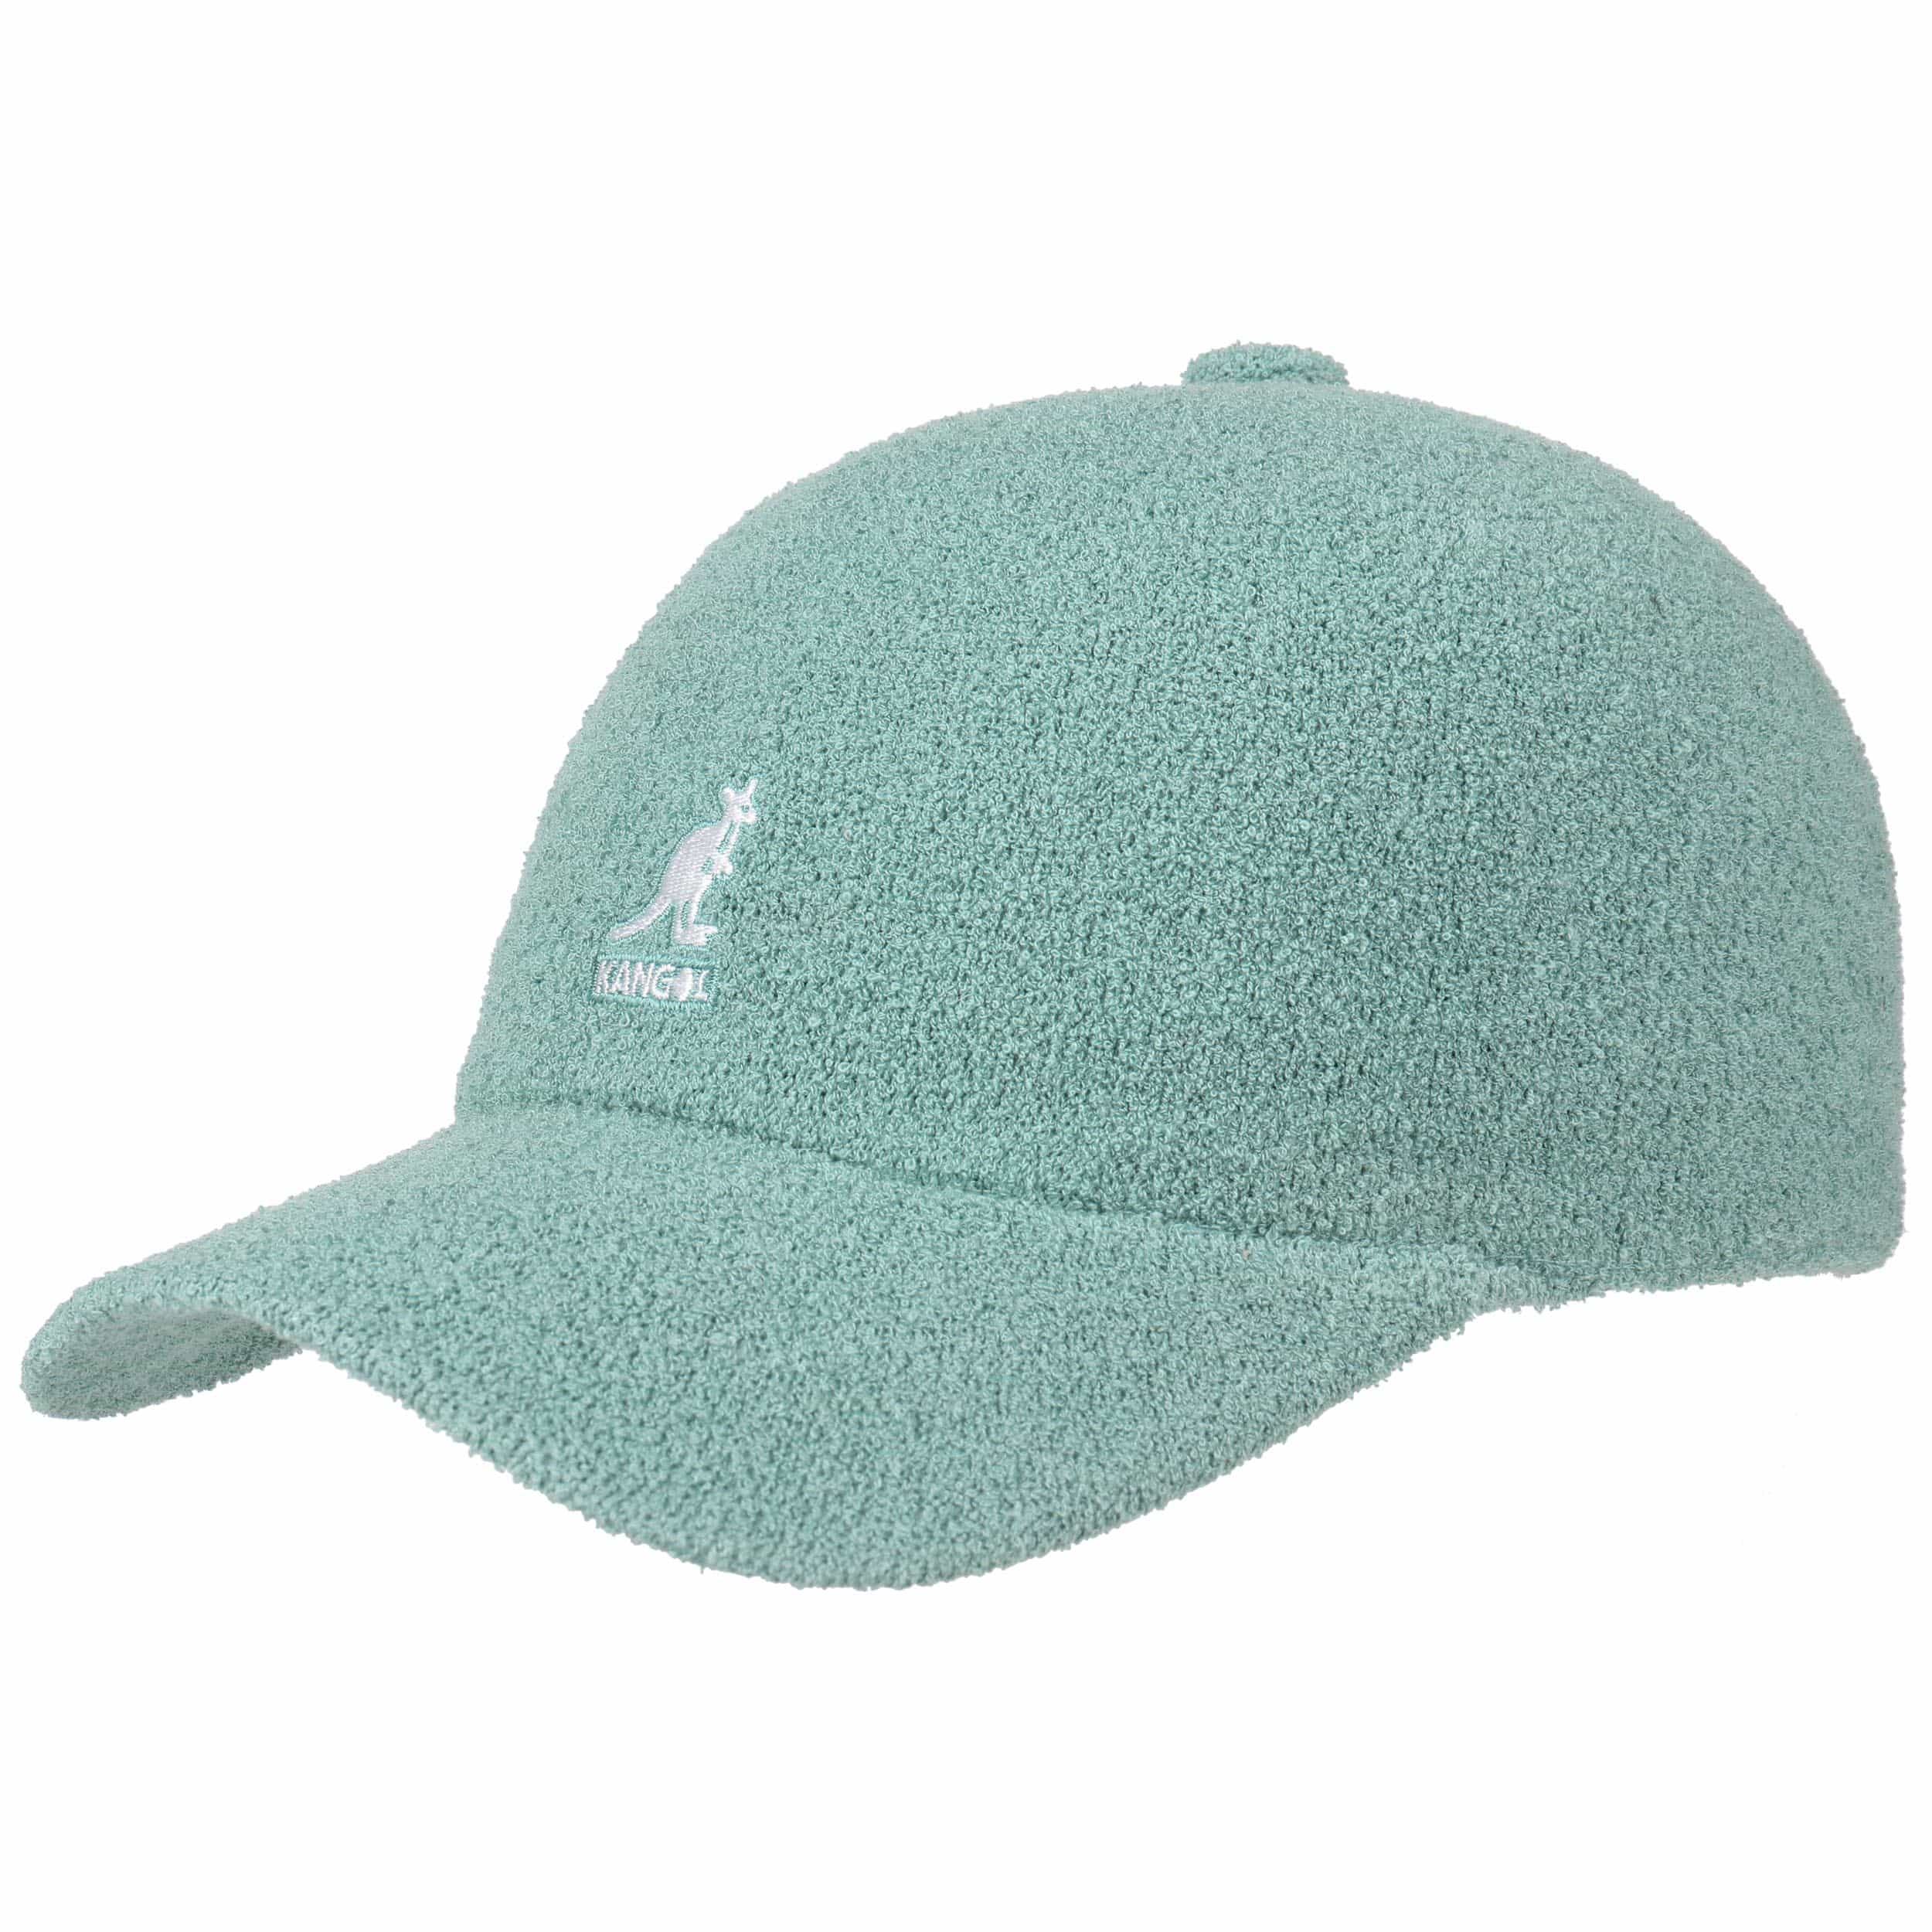 75f04cd9f5cfb9 ... Bermuda Baseball Cap by Kangol - mint green 5